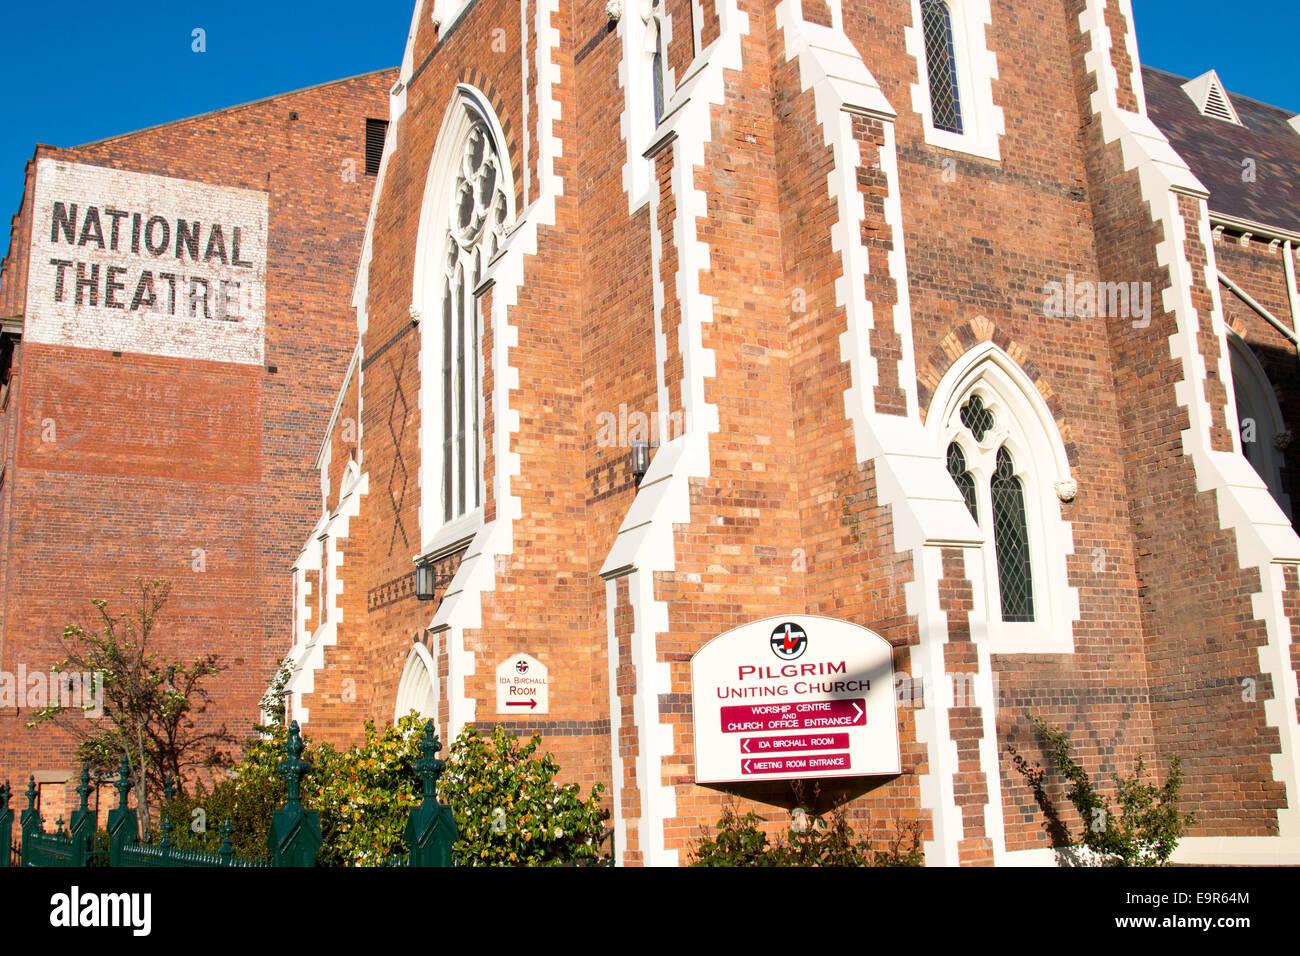 Launceston national theatre and pilgrim uniting church, tasmania,australia - Stock Image